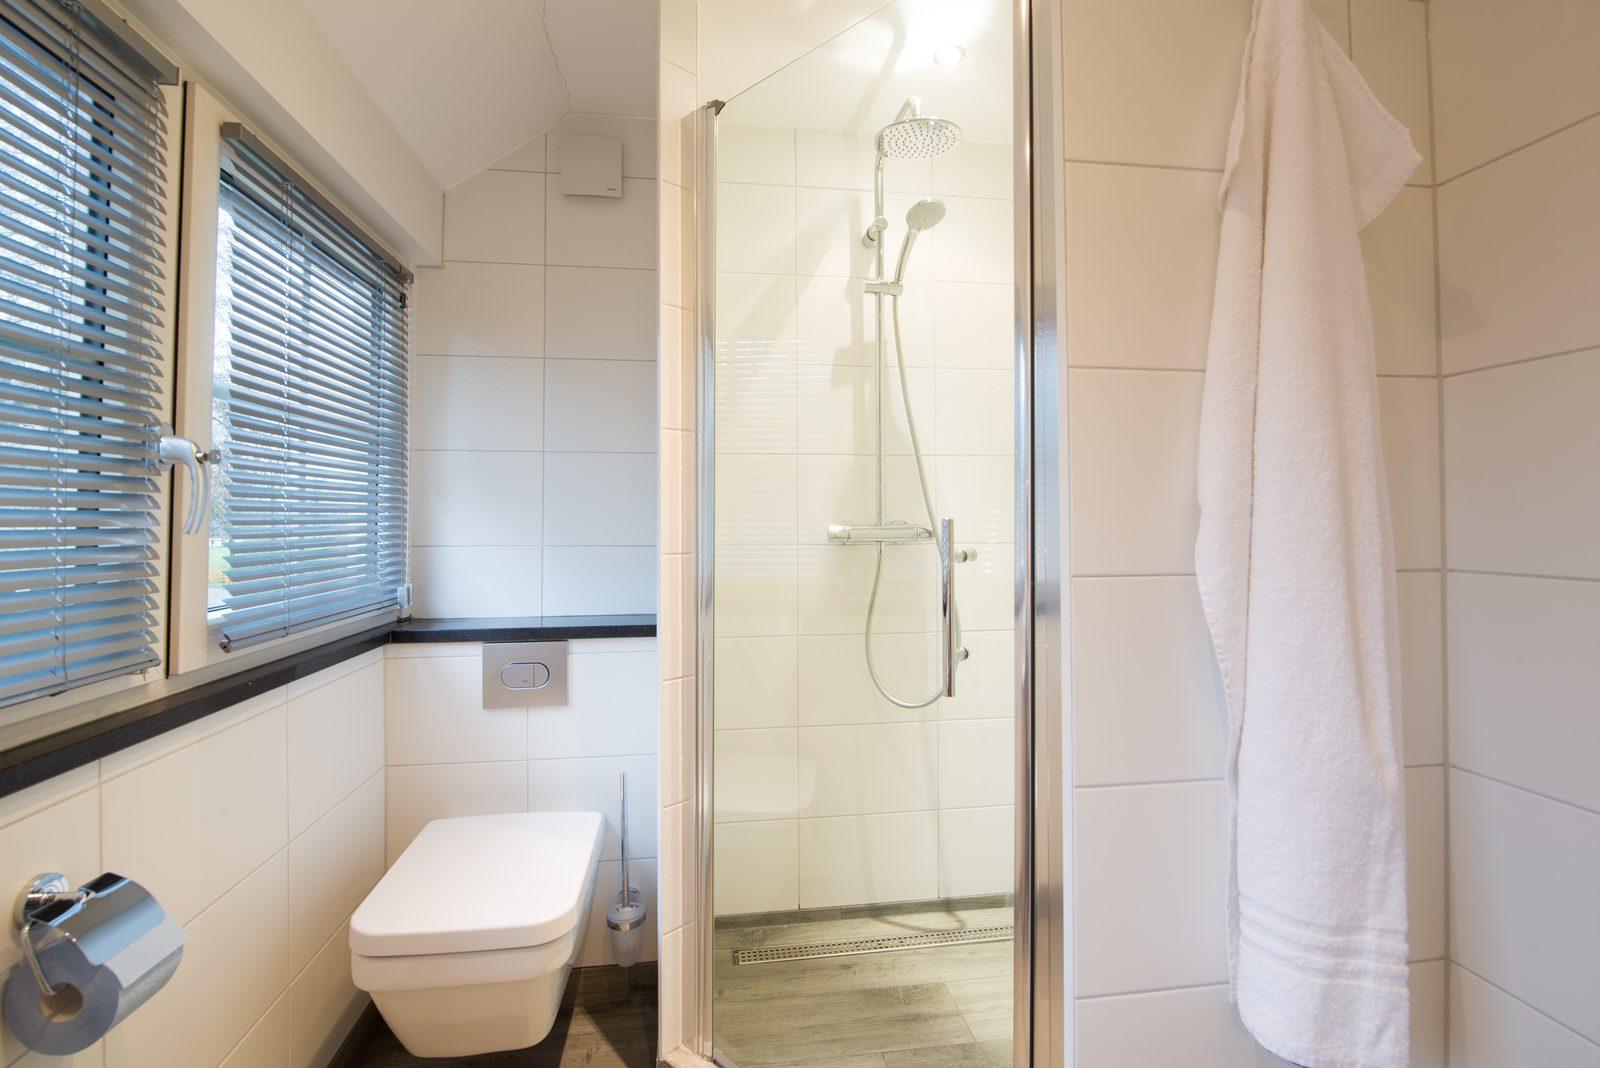 Wilgenhaege: luxe groepswoning met meerdere badkamers